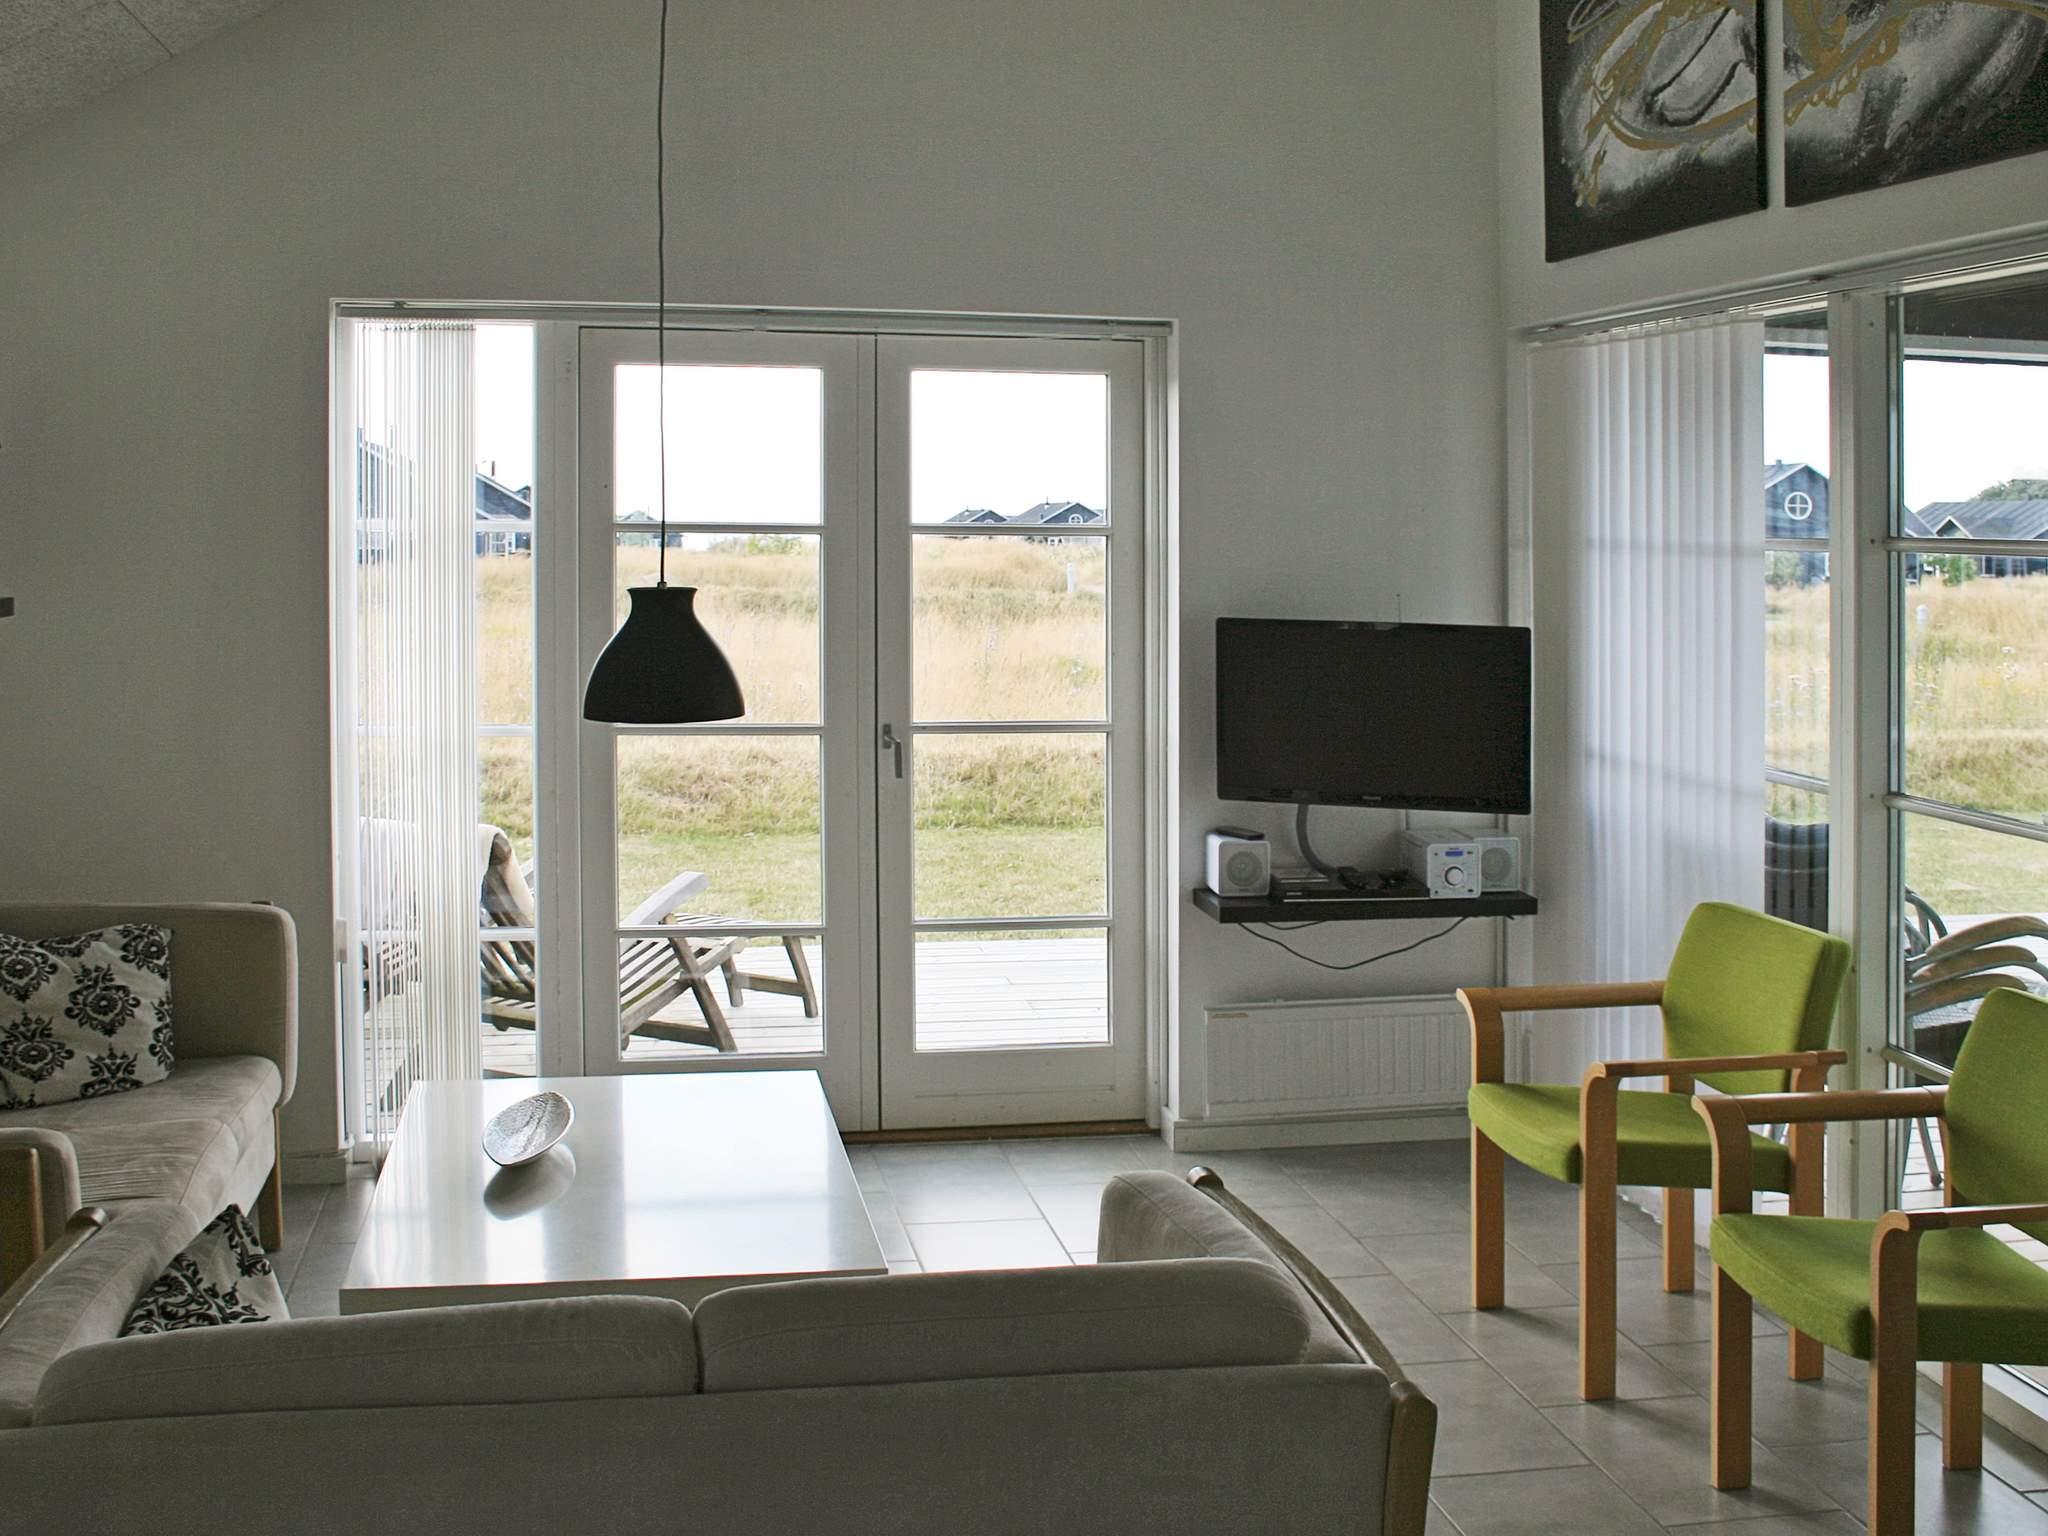 Ferienhaus Nysted (494756), Nysted, , Lolland, Dänemark, Bild 5